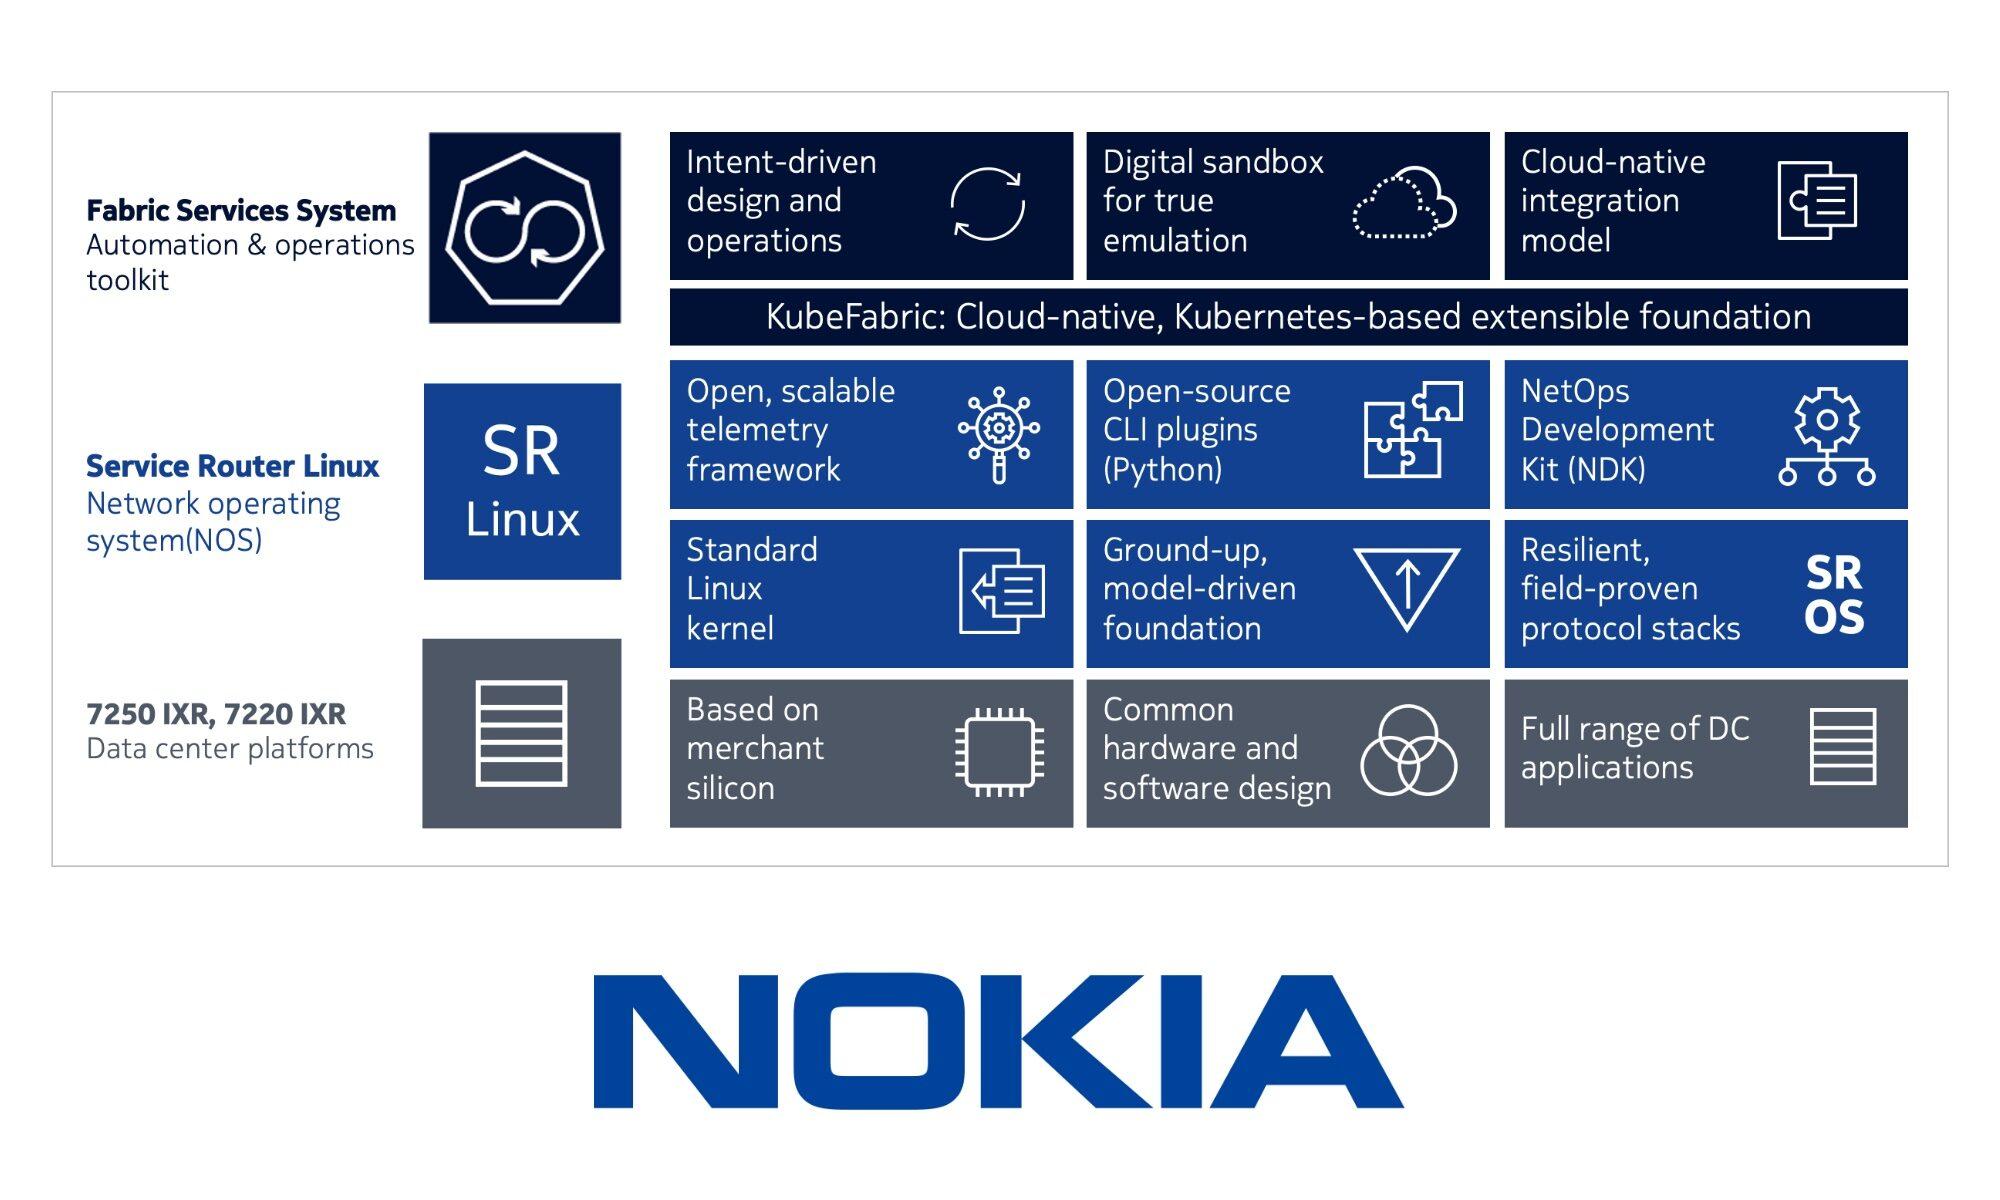 Nokia SR Linux Data Center